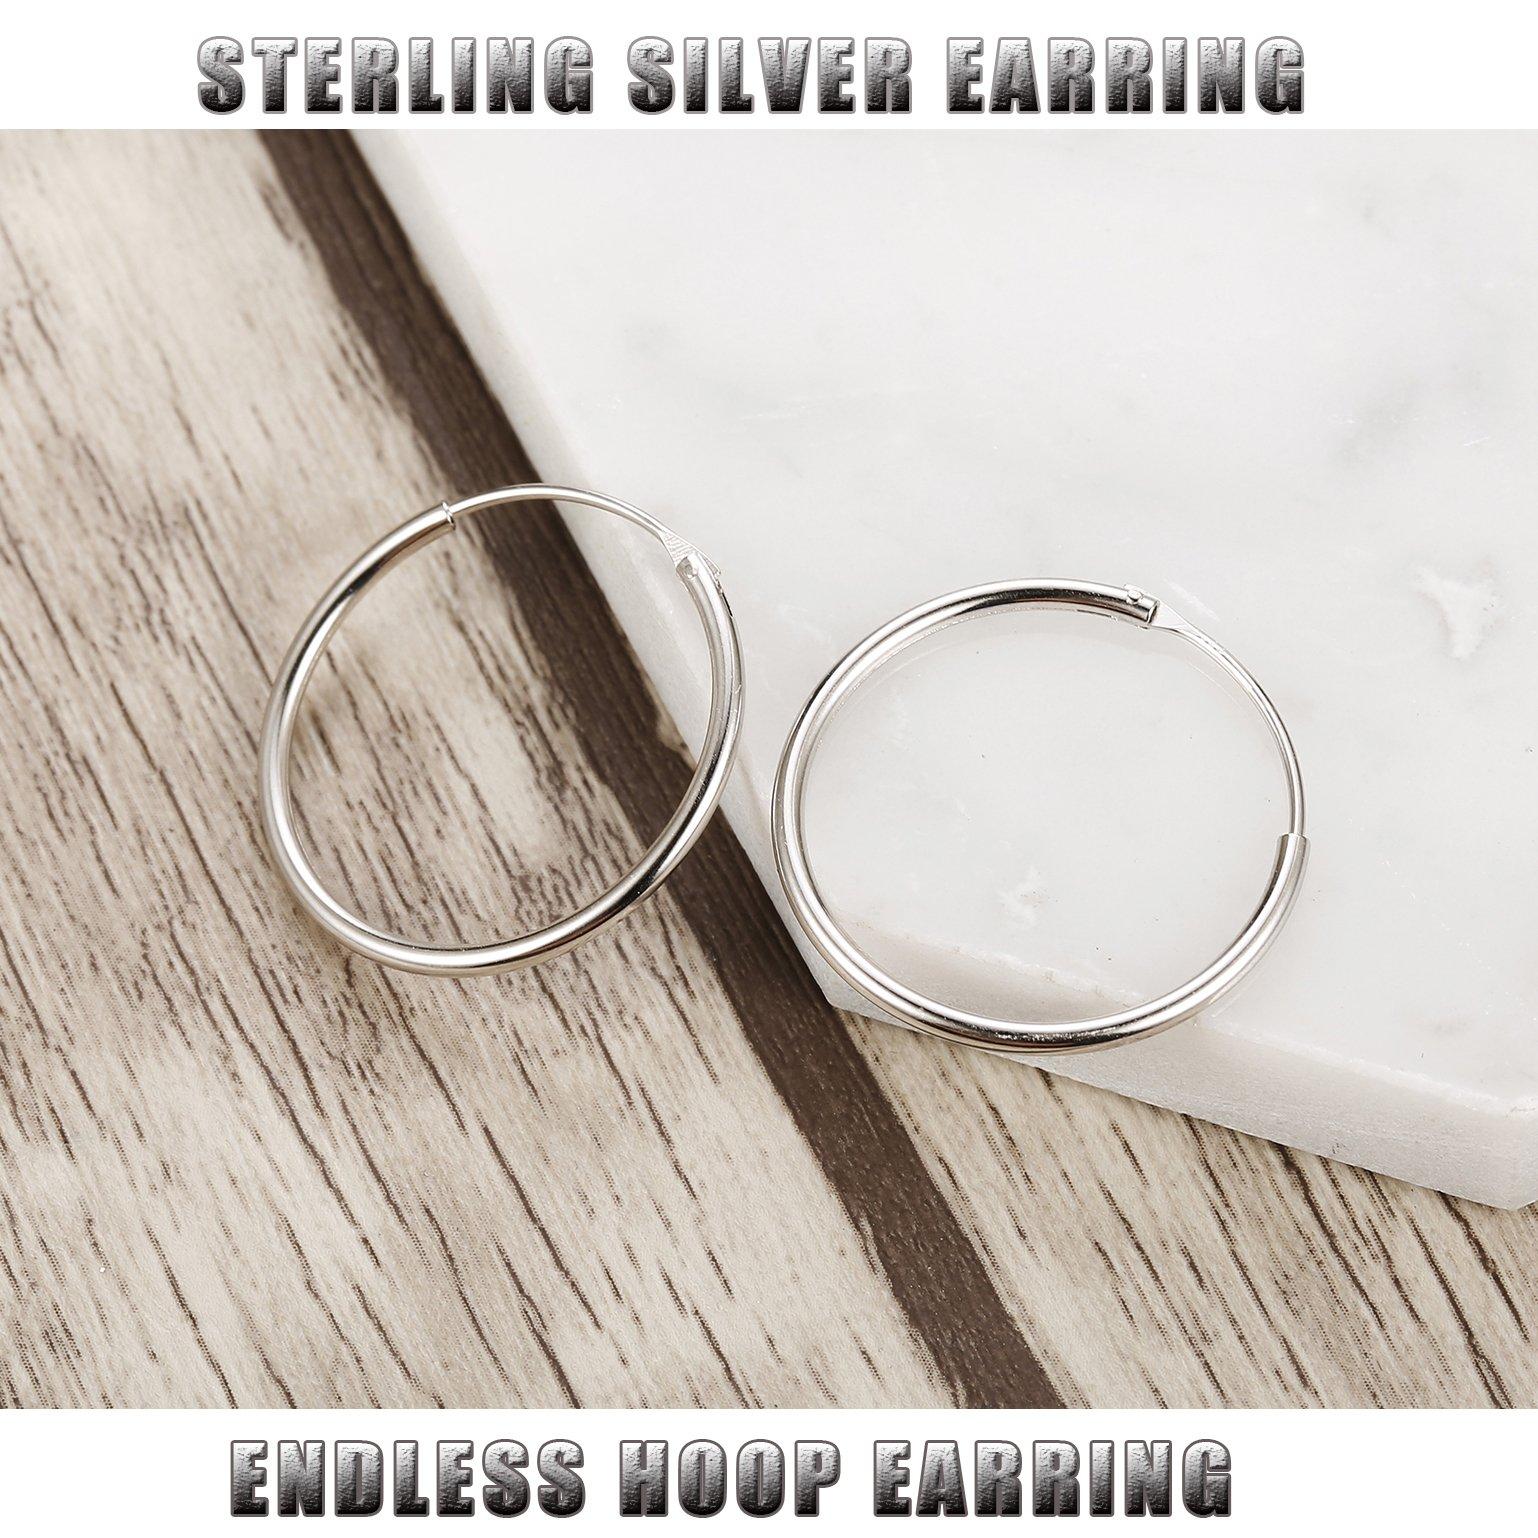 FUNRUN JEWELRY 3 Pairs Sterling Silver Hoop Earrings for Women Men Round Earrings Set 10-40MM (B: Platinum-Plated 3 Pairs: 20MM/30MM/40MM) by FUNRUN JEWELRY (Image #5)